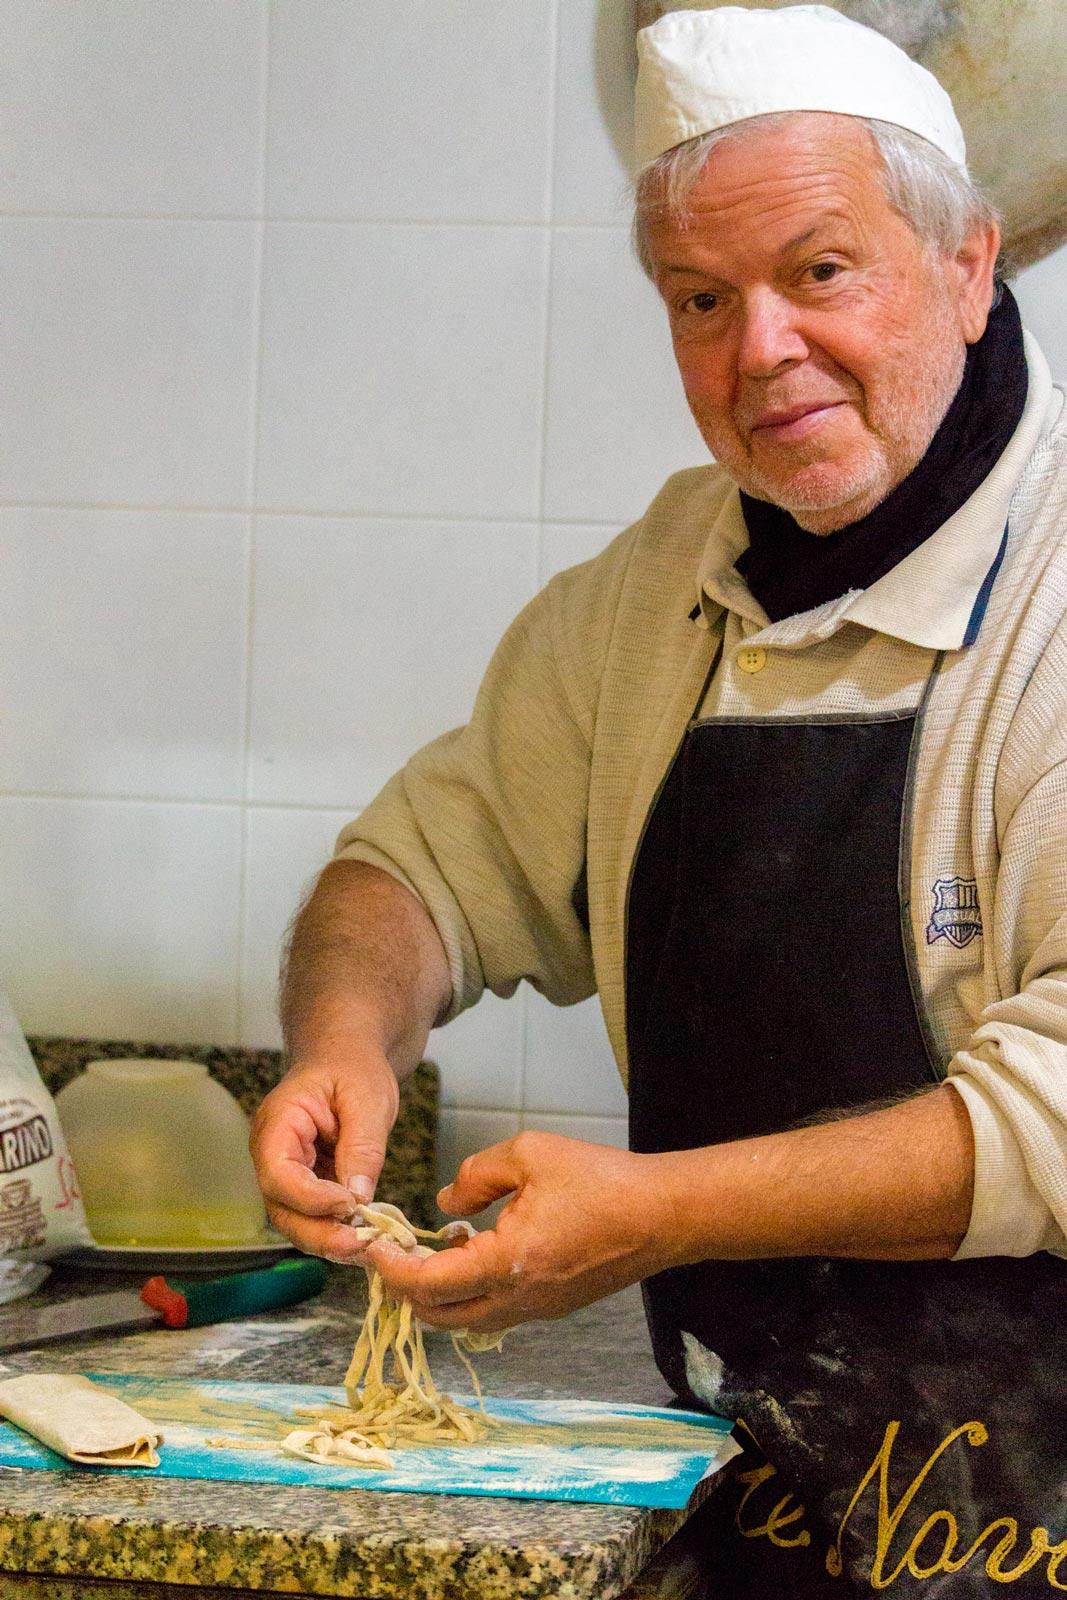 Luigi Vidili | azienda agricola